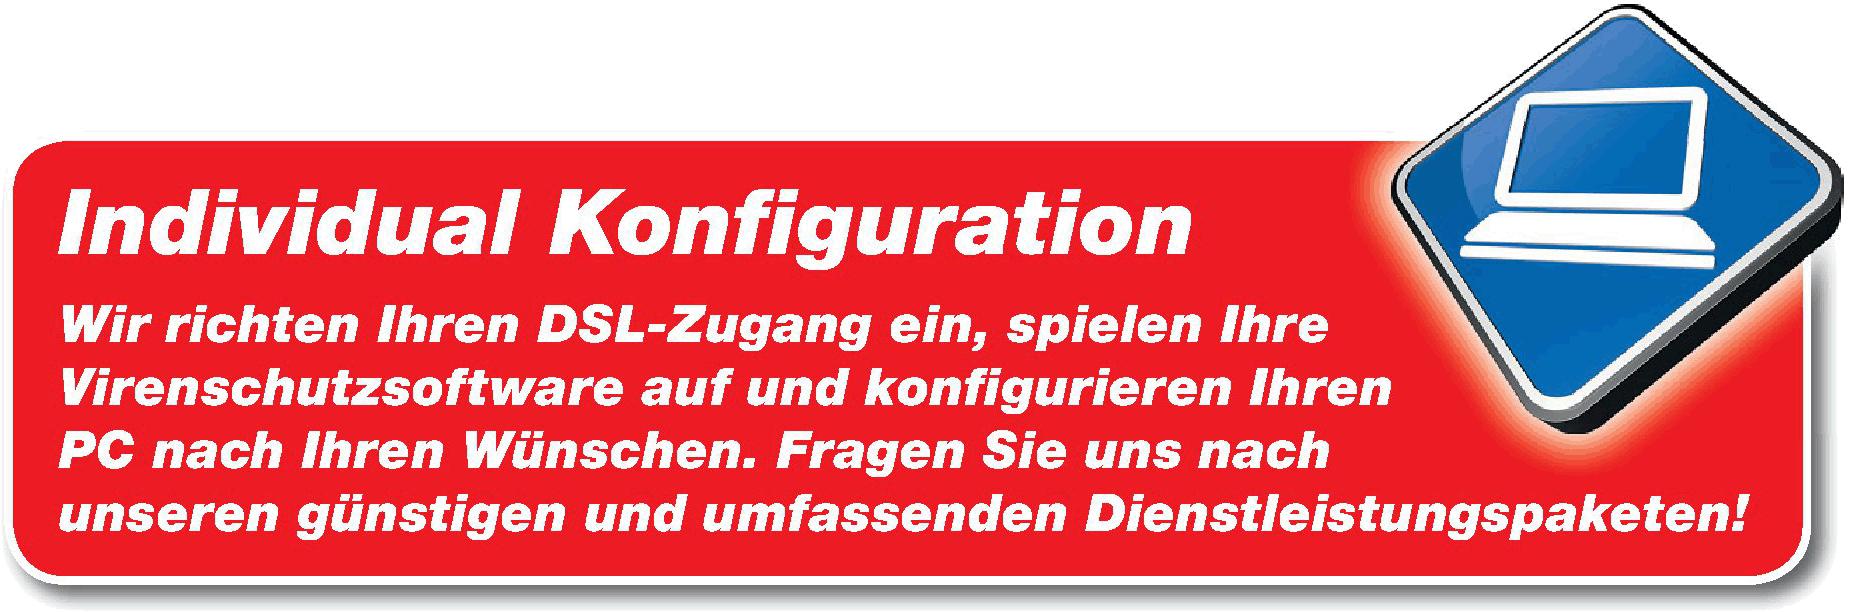 Individual Konfiguration